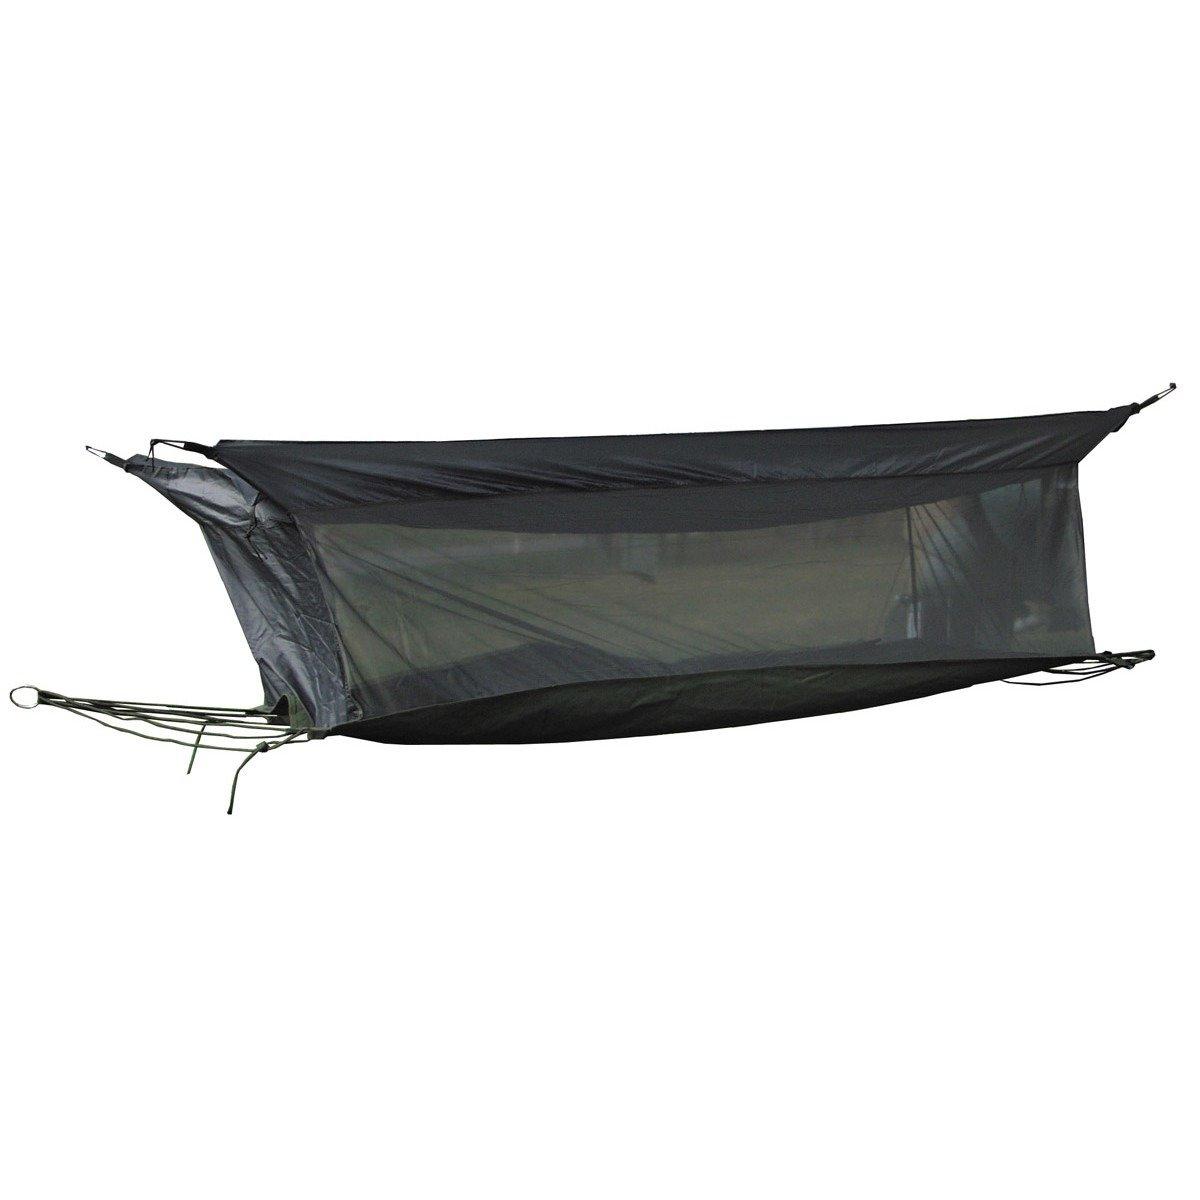 army hammock   jungle   w mosquito   od green     army hammock   jungle   w mosquito   od green   trekking      rh   militarysurplus ro